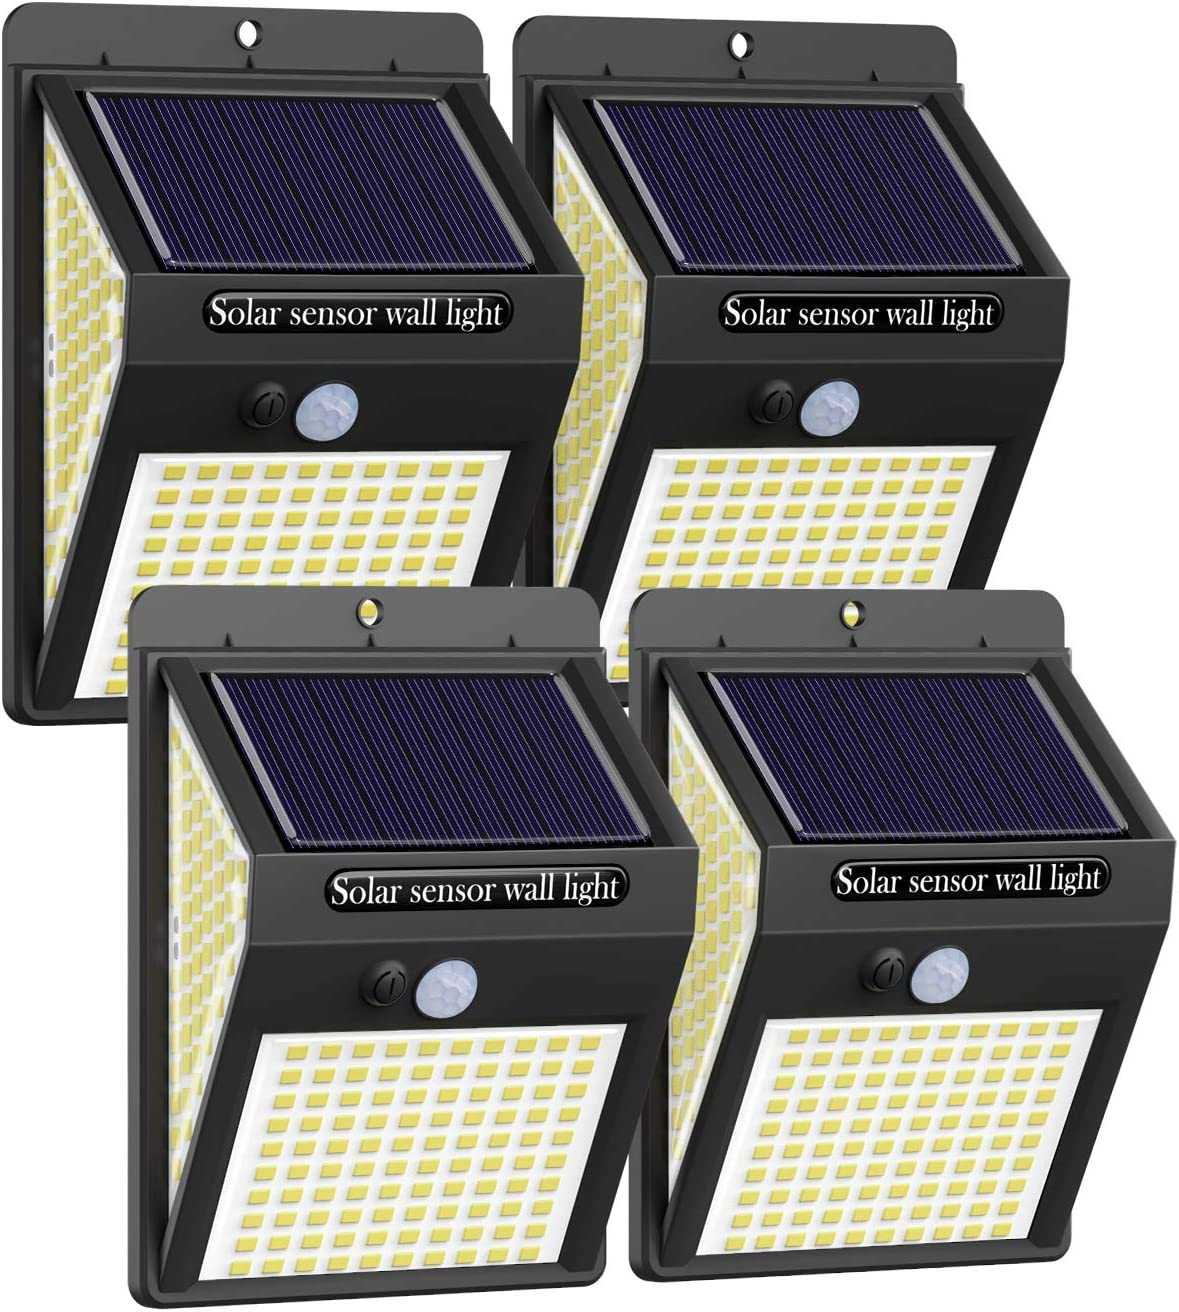 [4Packs 220LED ]Solar Motion Sensor Light Outdoor,Litogo Solar Lights Outdoor IP65 Waterproof 3 Modes Solar Fence Lights Solar Security Lights Flood Light for Garden Patio Yard Deck Garage Fence Pool